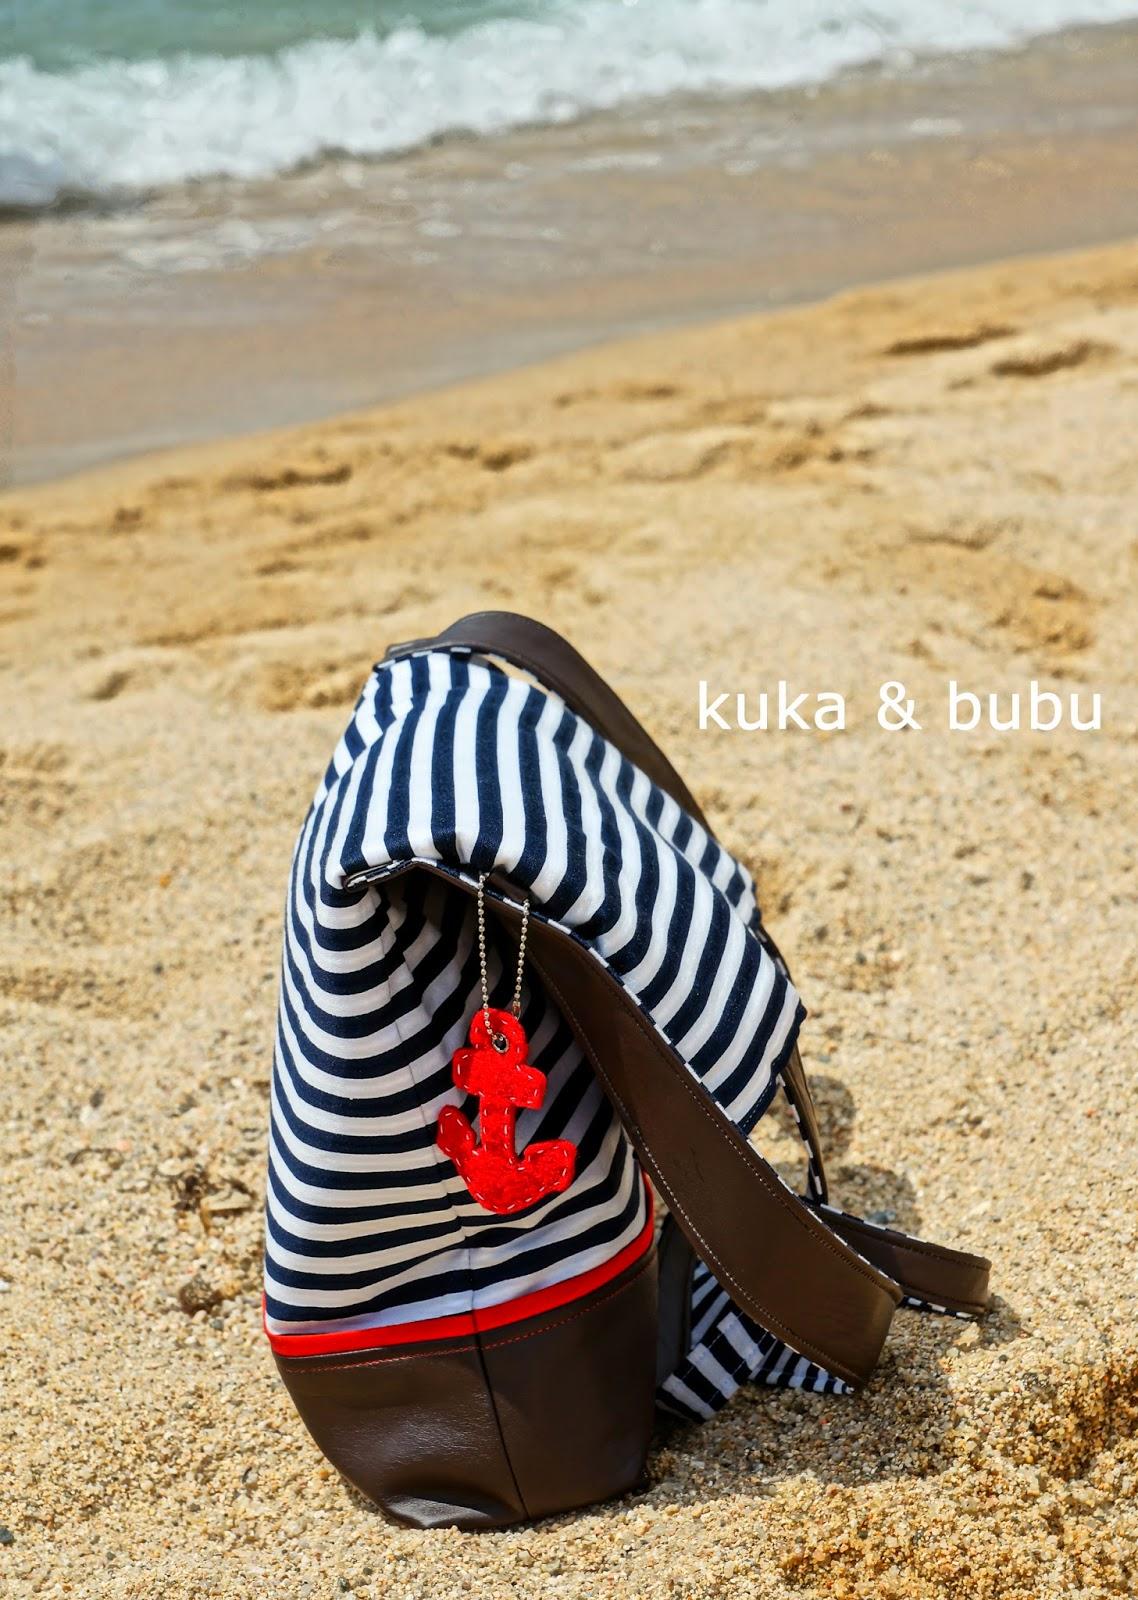 http://kukaandbubu.blogspot.com.es/2014/07/viator-sant-antoni-edition.html